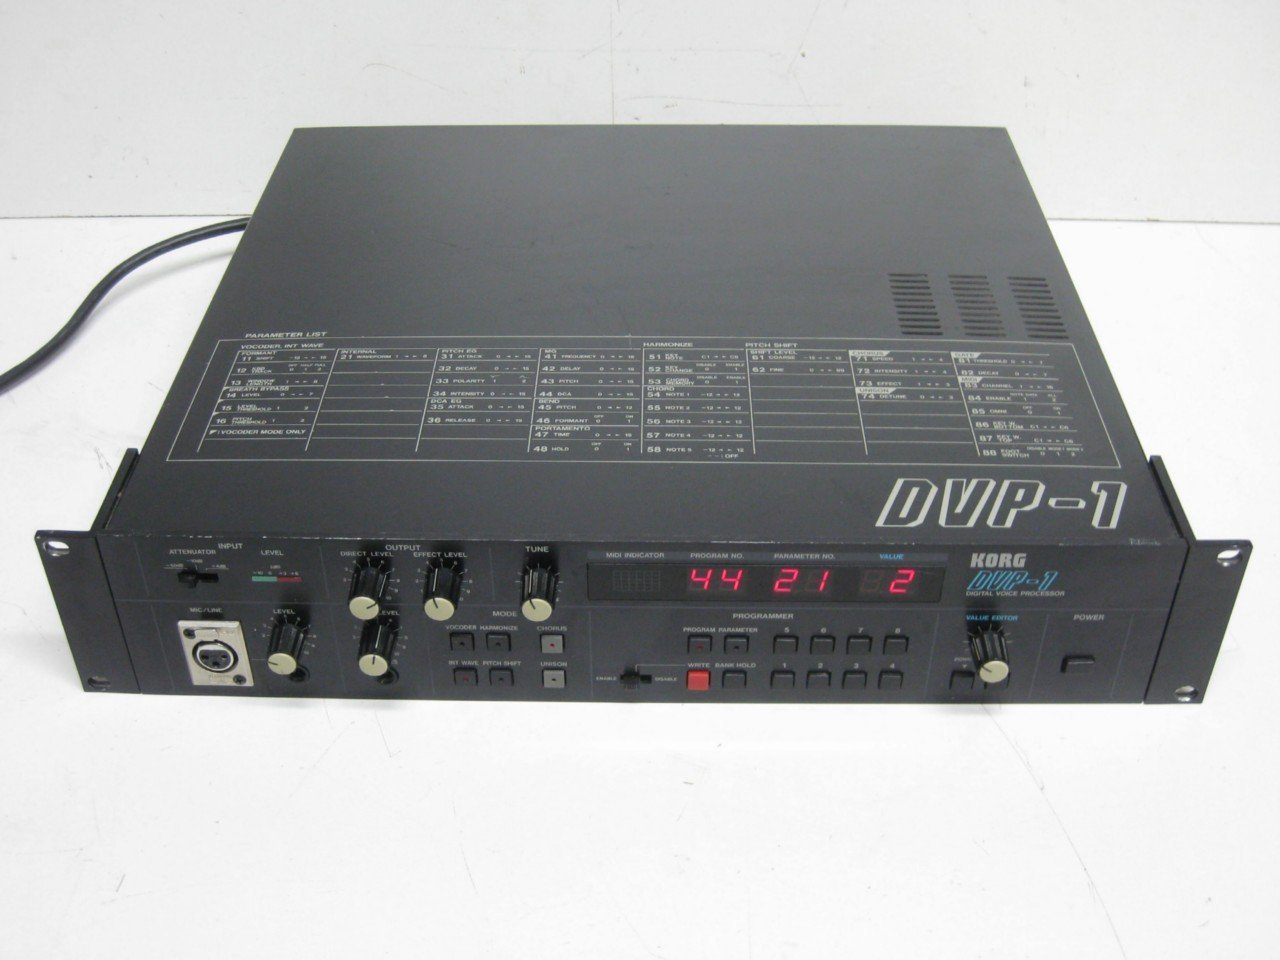 KORG DVP-1 Digital voice processor